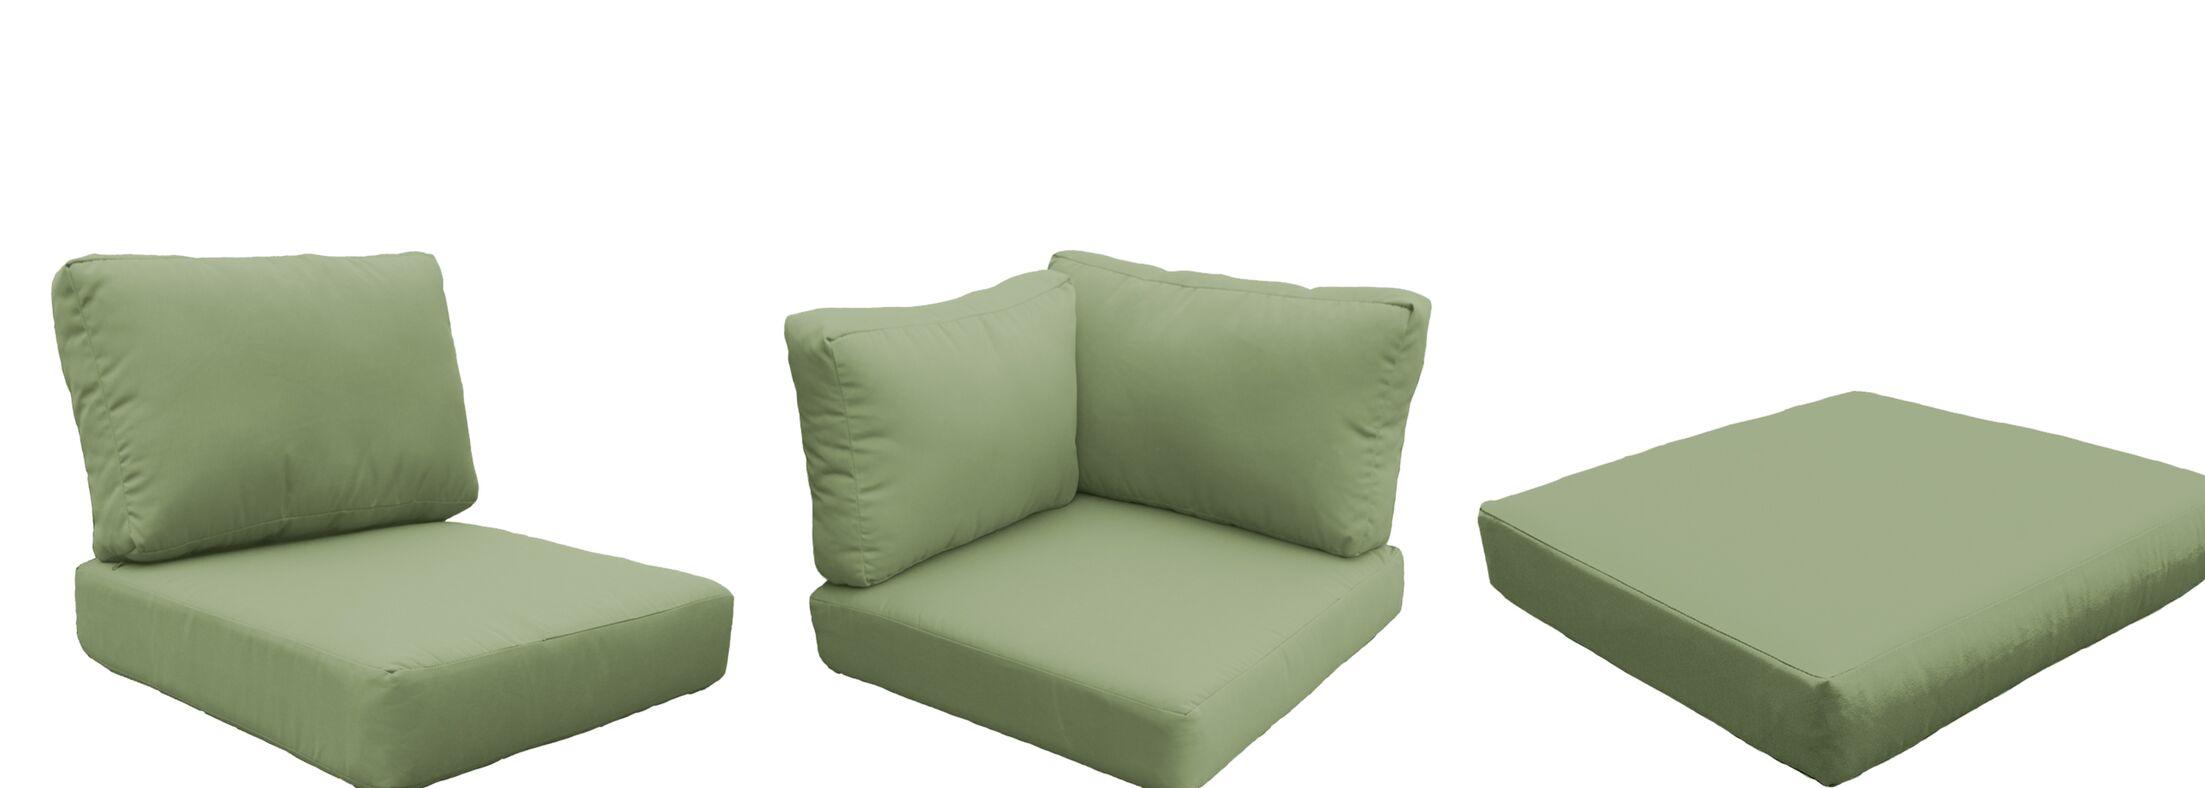 Florence 12 Piece Outdoor Cushion Set Fabric: Cilantro